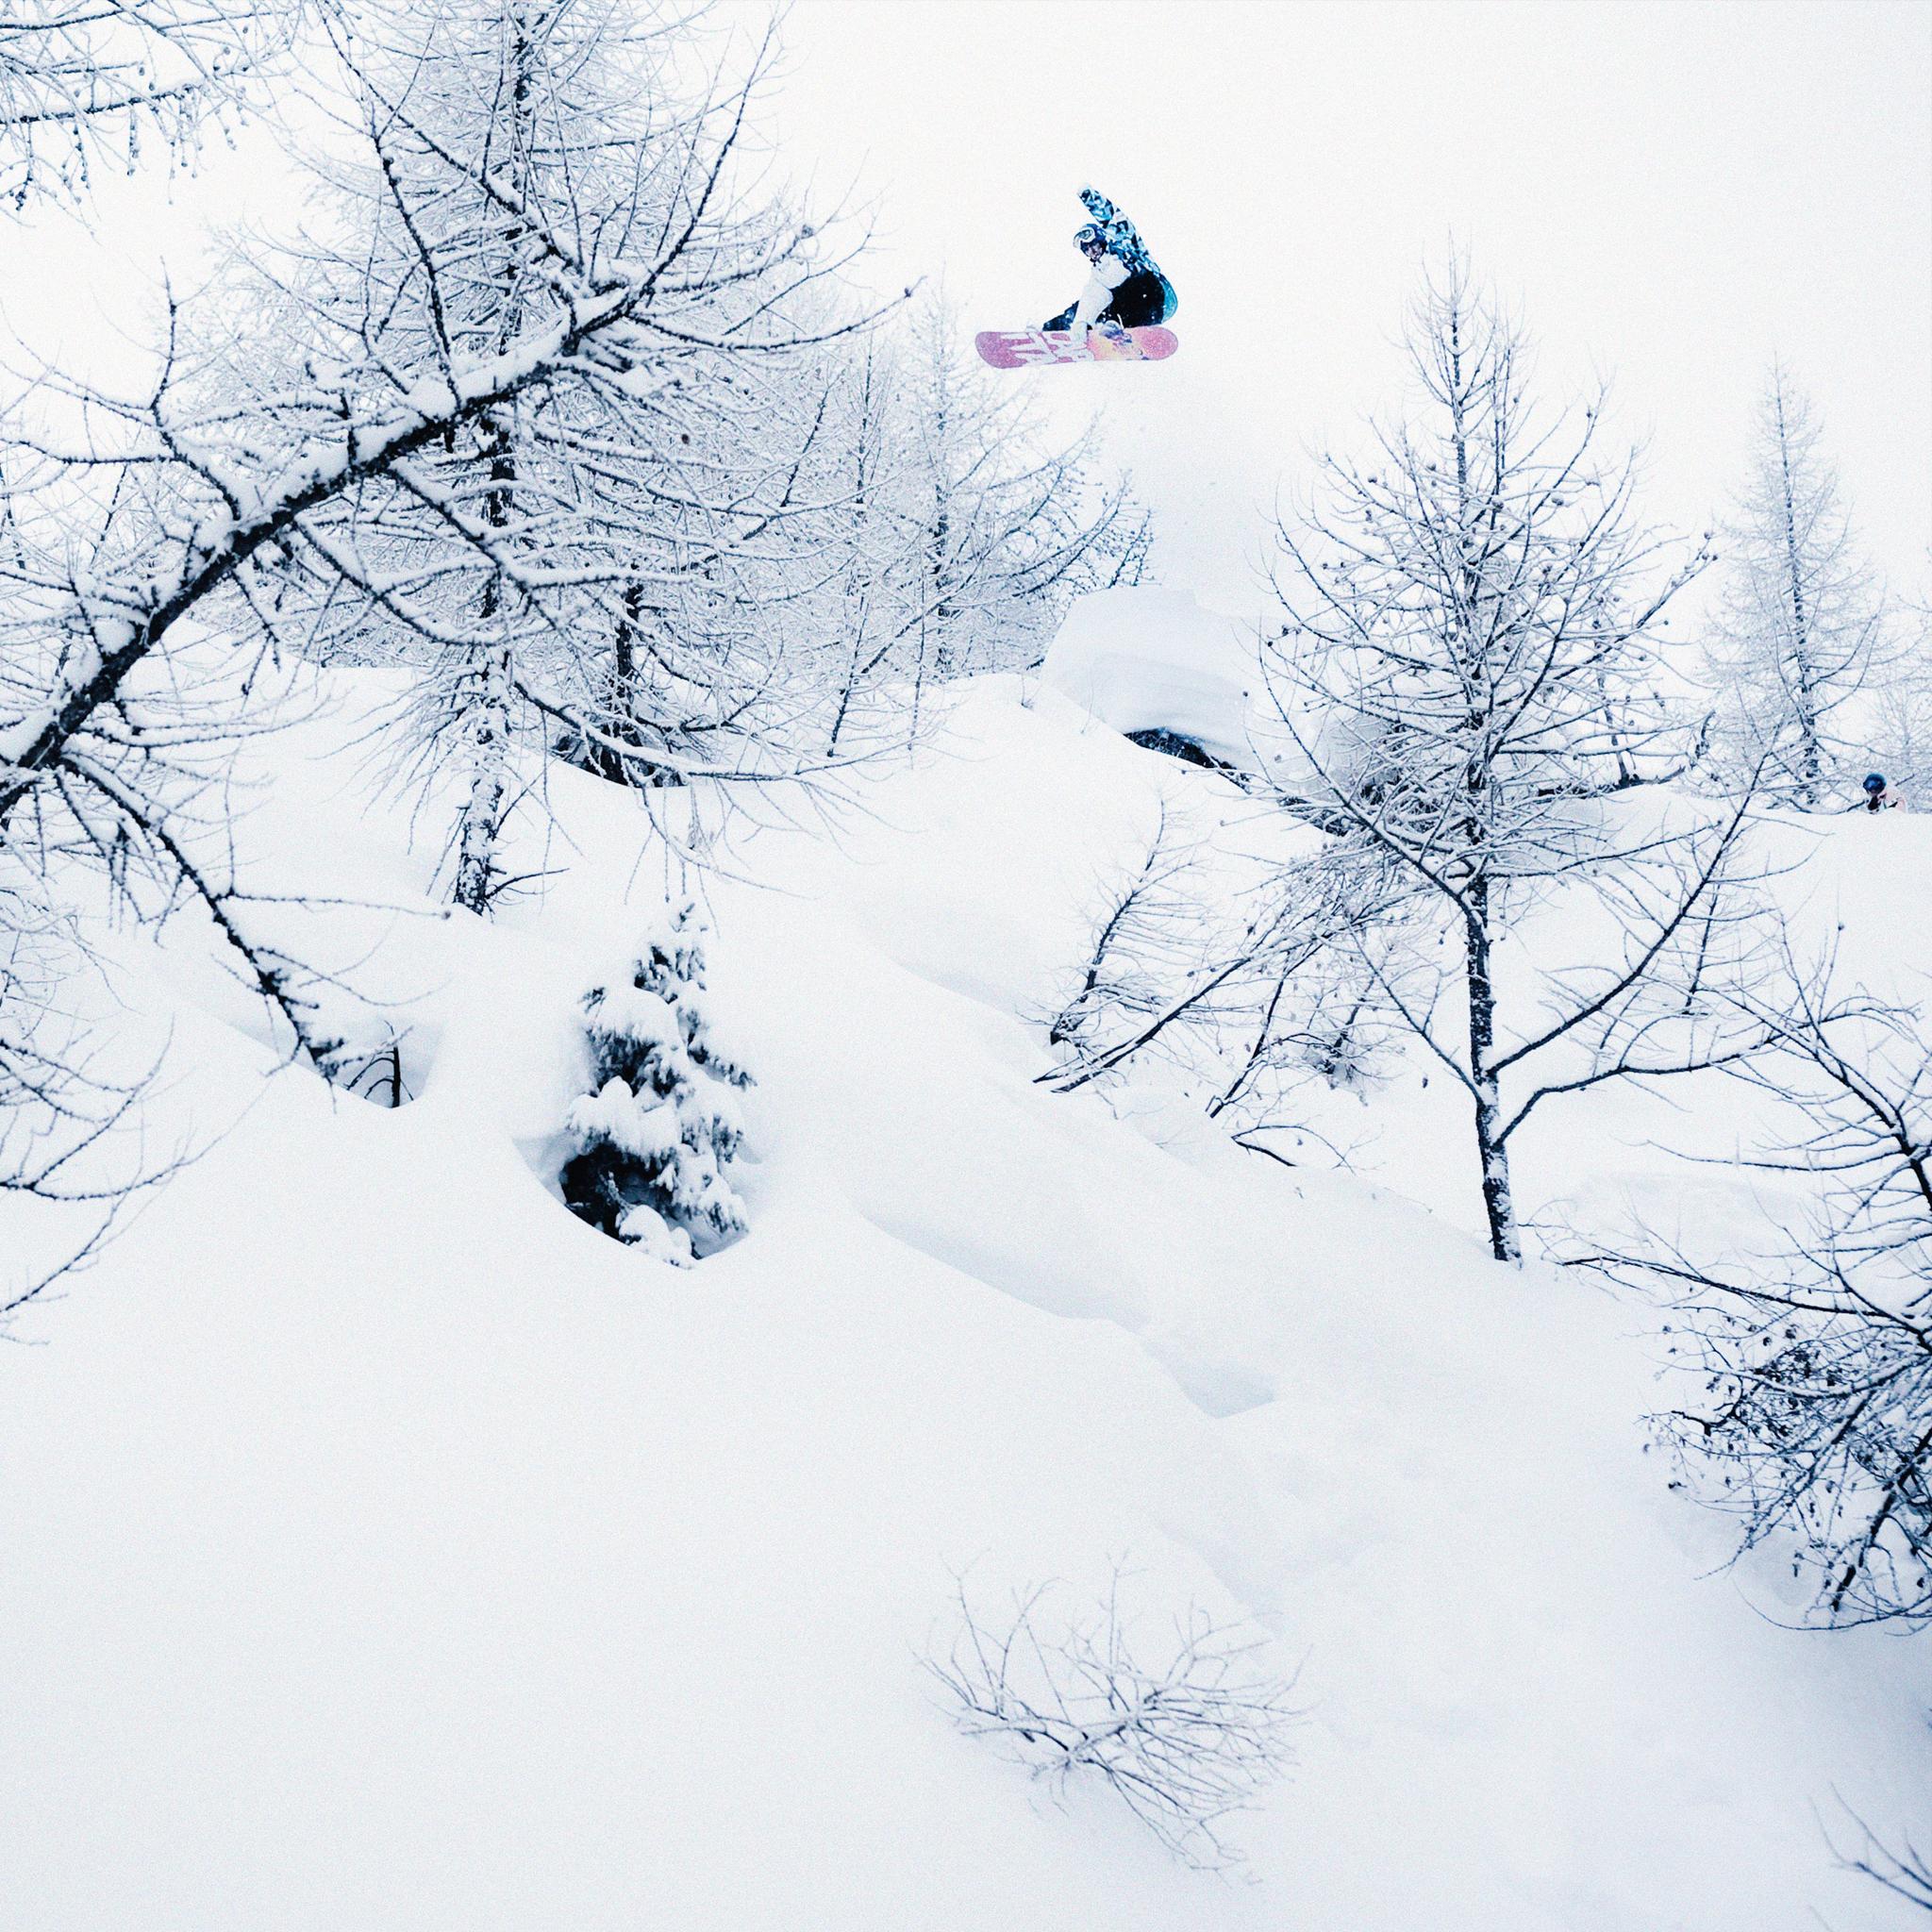 Rene Schnoler Snowboard 3 Wallpapers iPad Rene Schnoller Snowboard   iPad